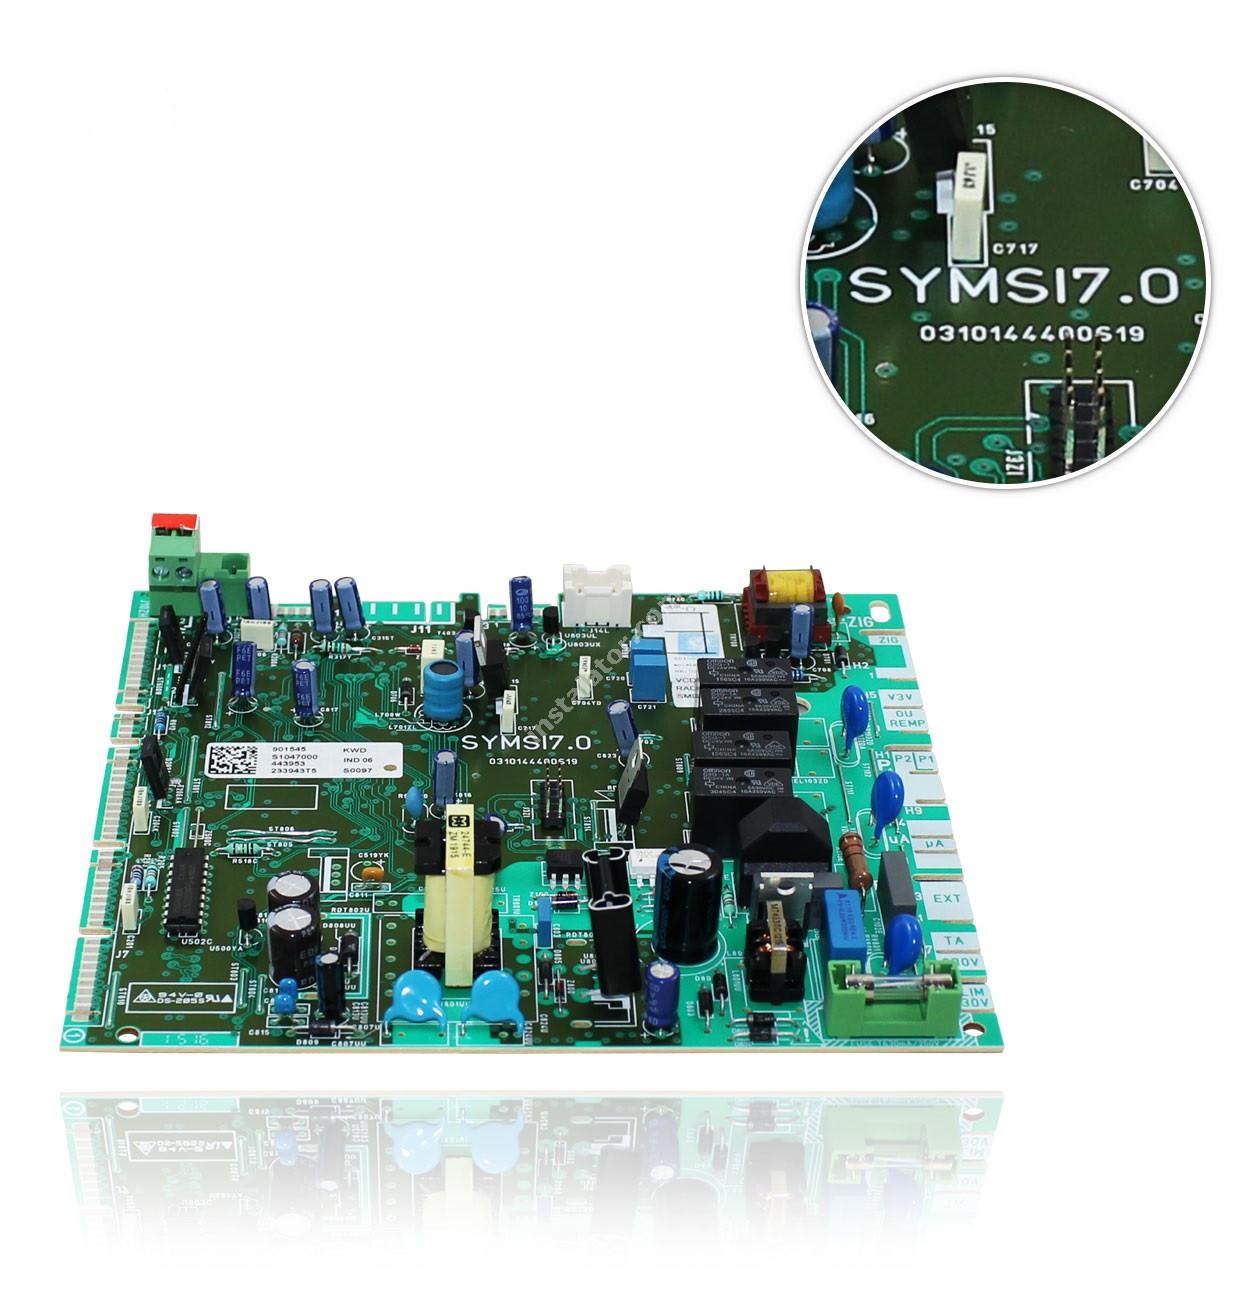 S1047000 Плата керування (основна) SAUNIER DUVAL ThemaClassic, Isofast, Combitek full-image-4